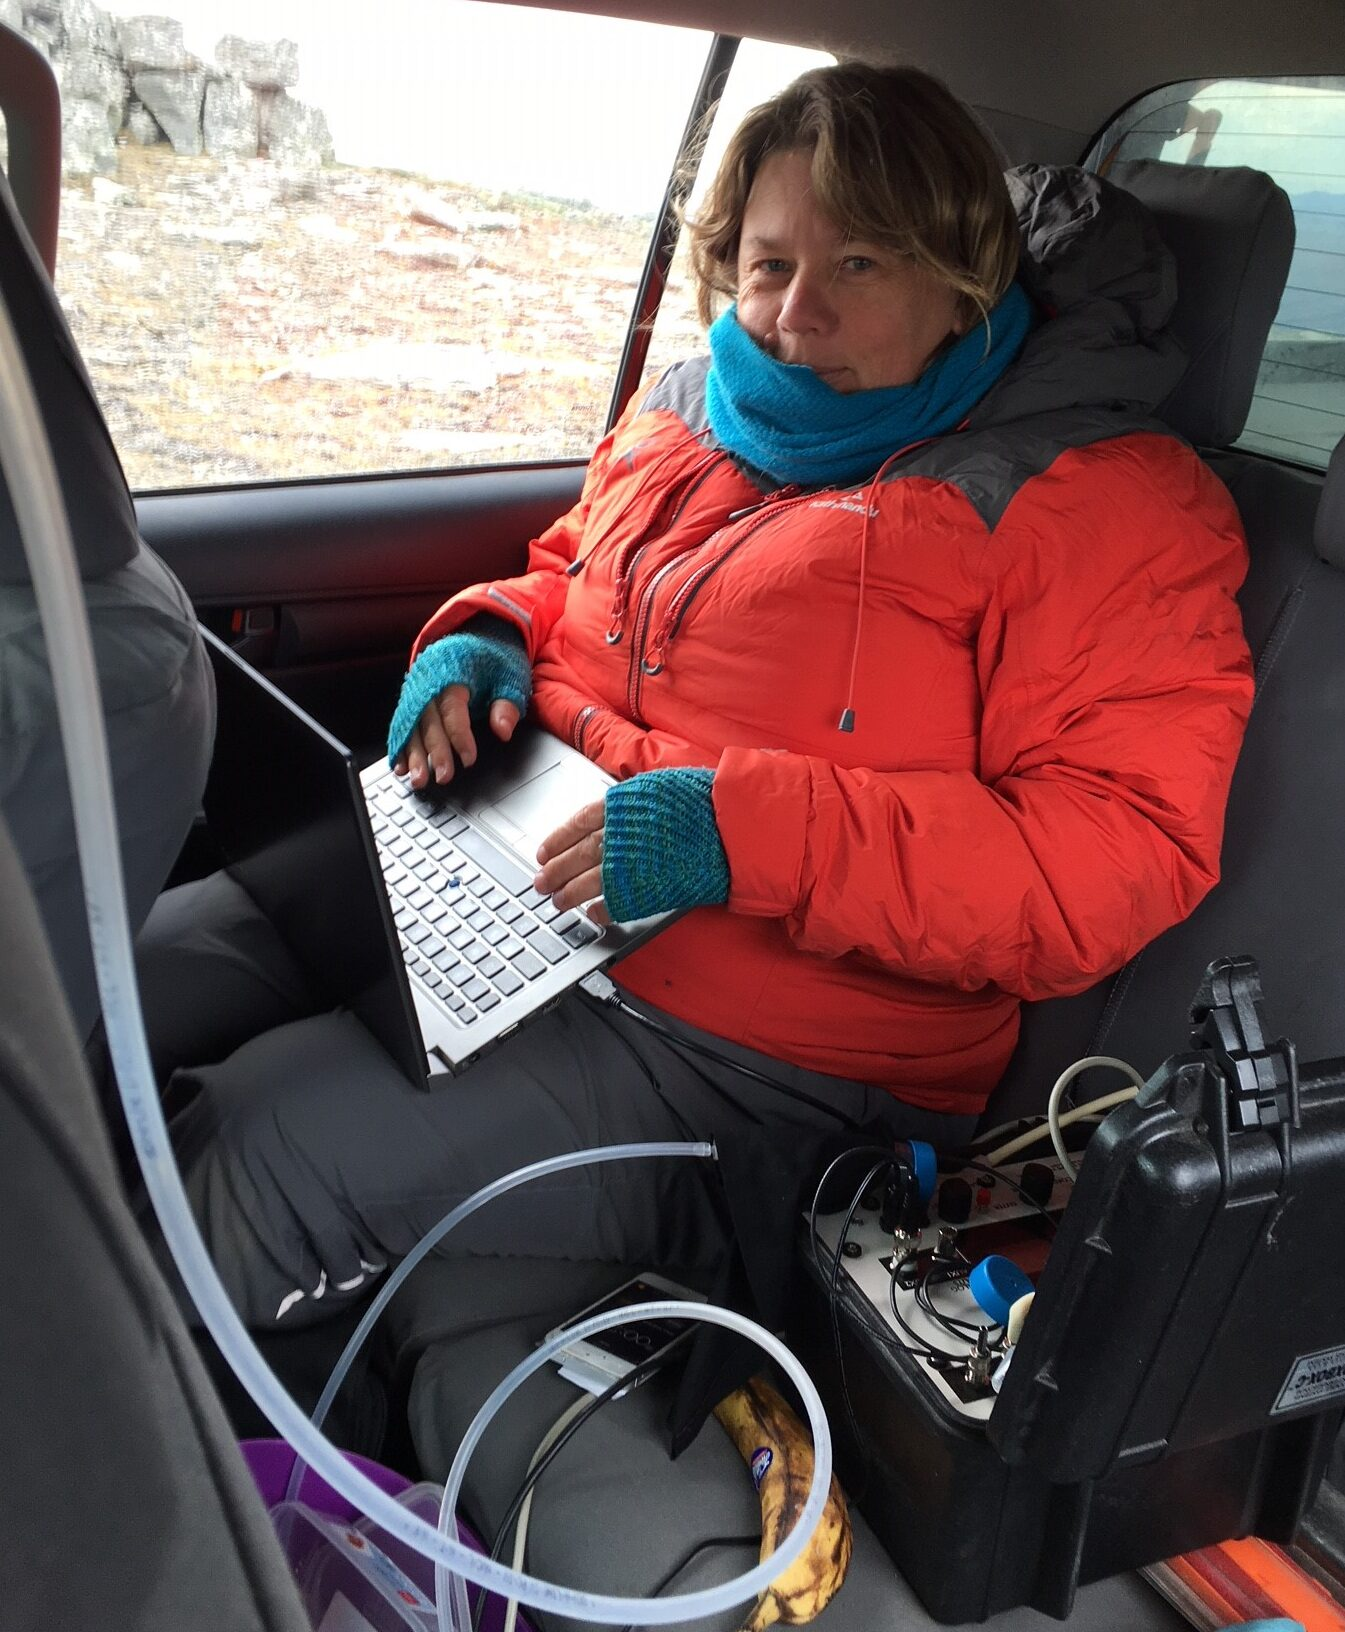 Cilla at fieldwork